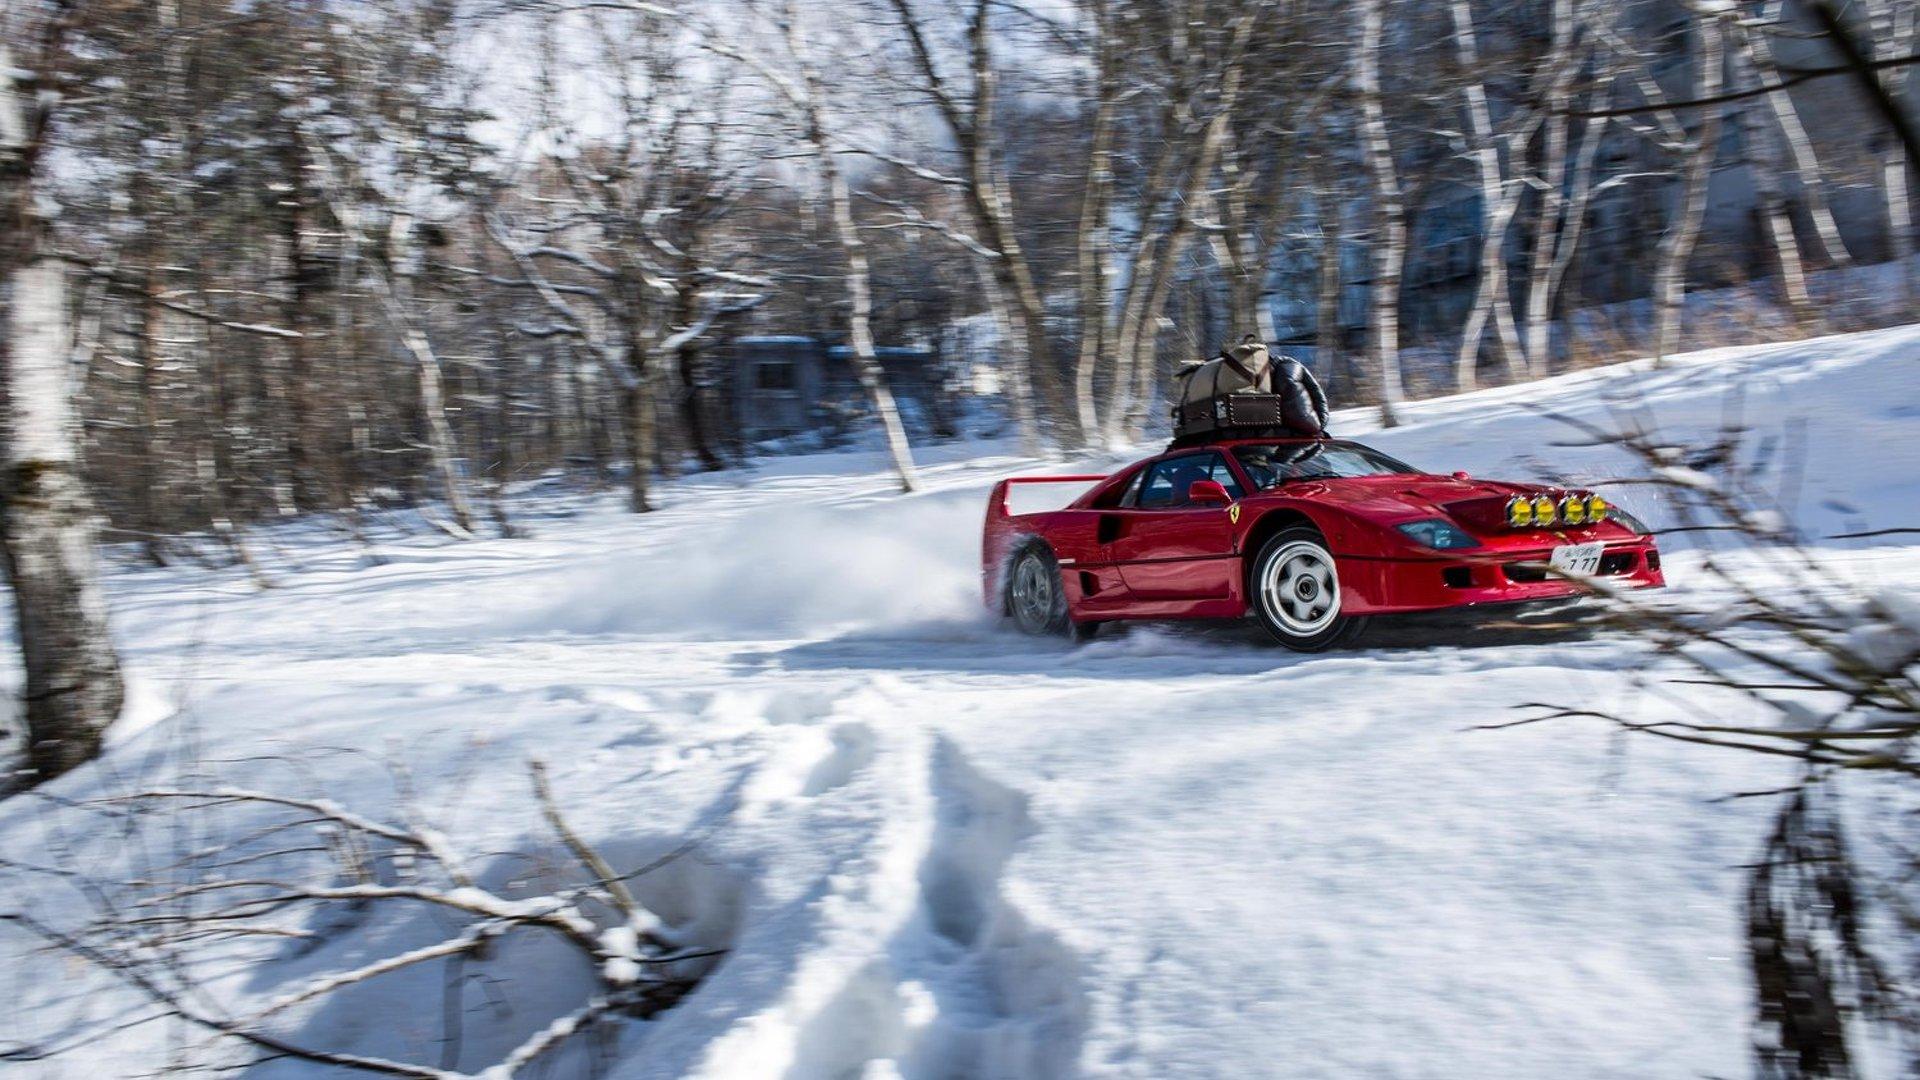 Ferrari F40 tackles a ski slope